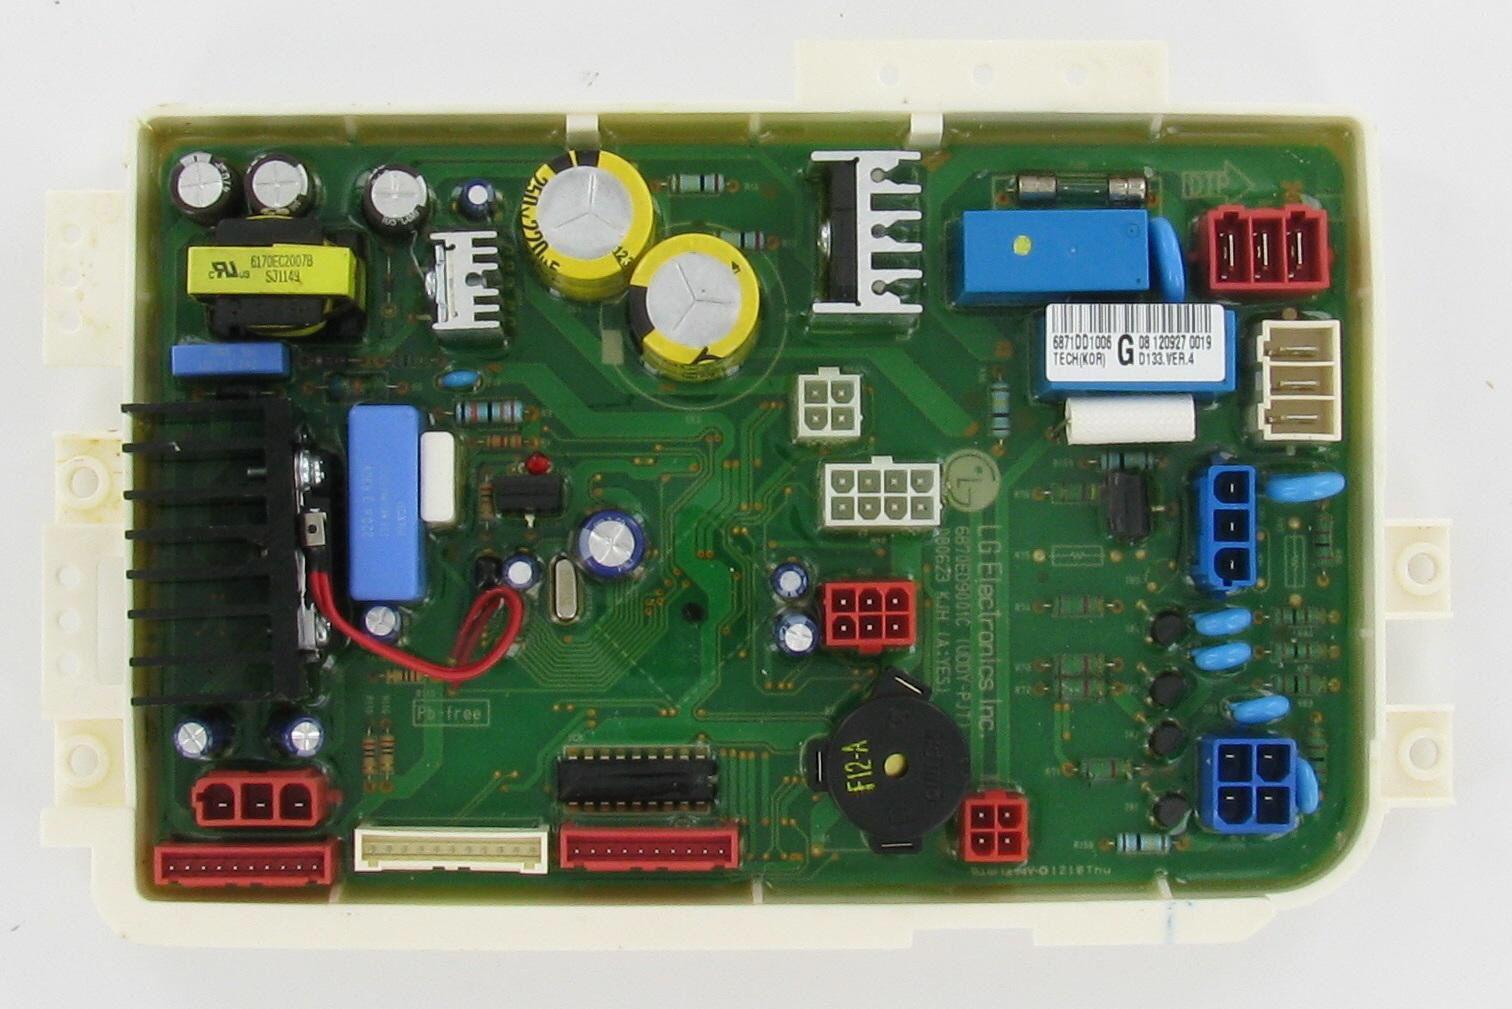 Lg 6871dd1006g Dishwasher Pcb Assembly Main Control Board Boards Broken Appliance Dishwasher